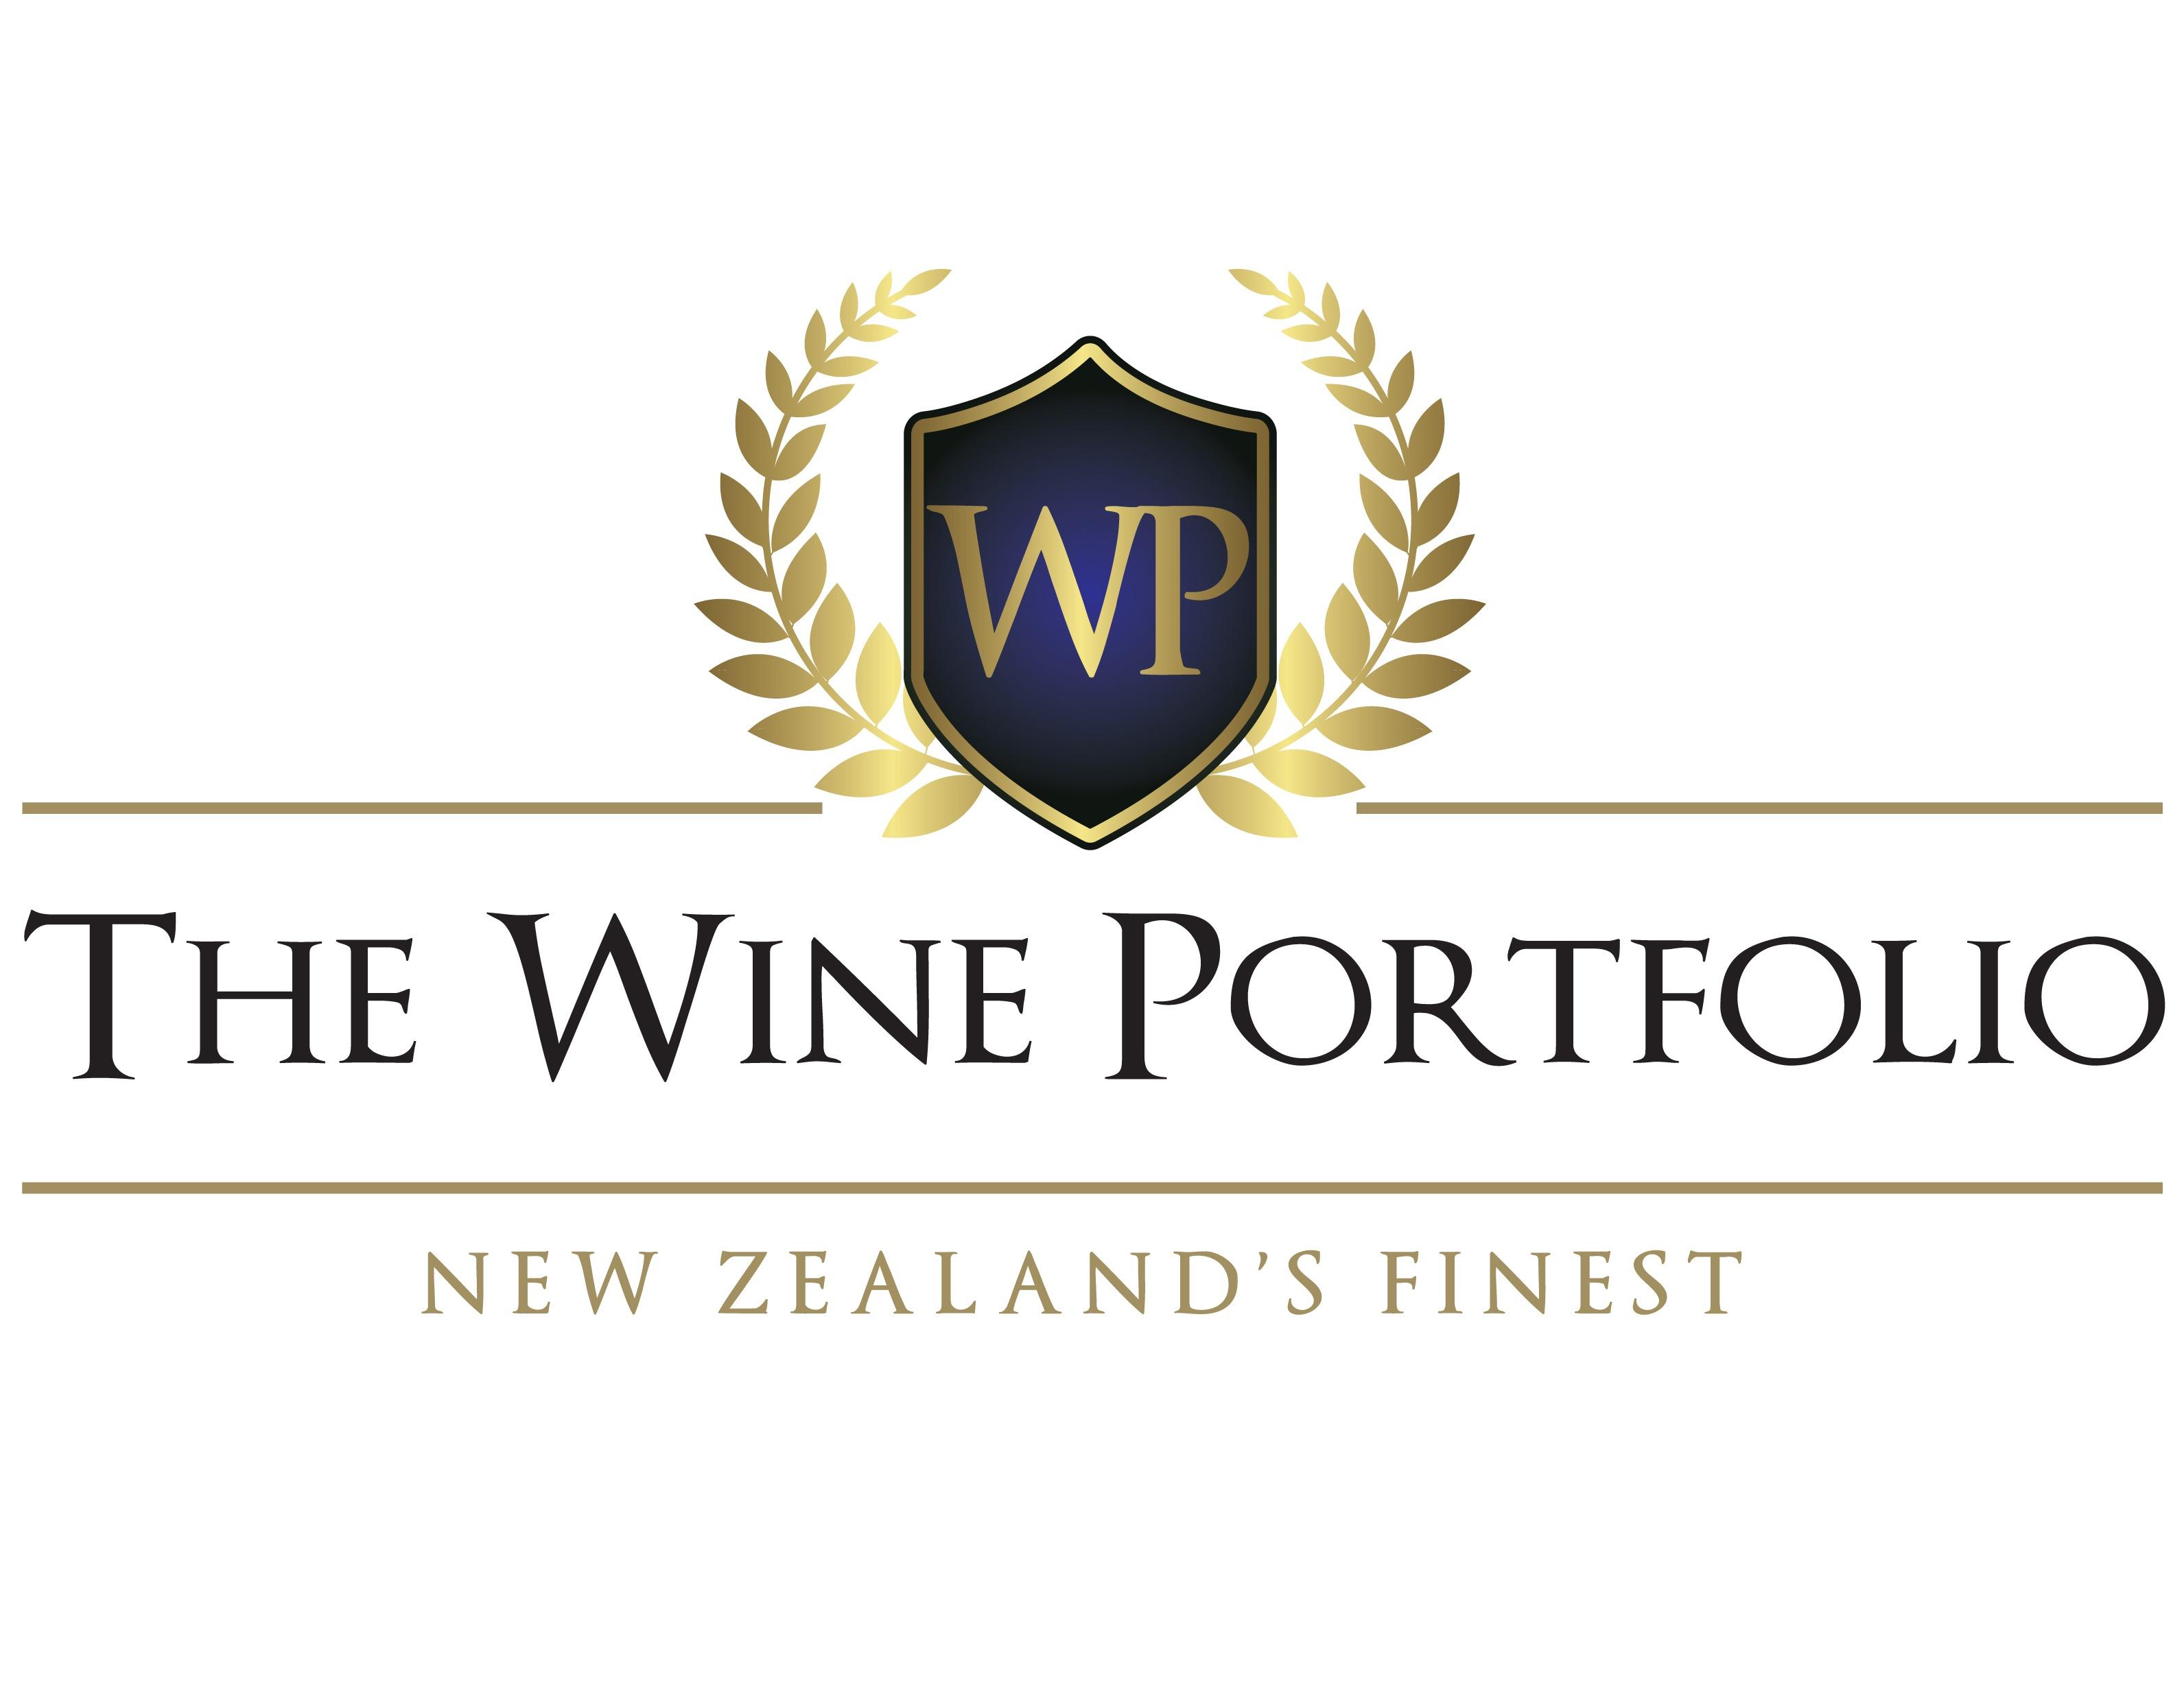 The Wine Portfolio Limited